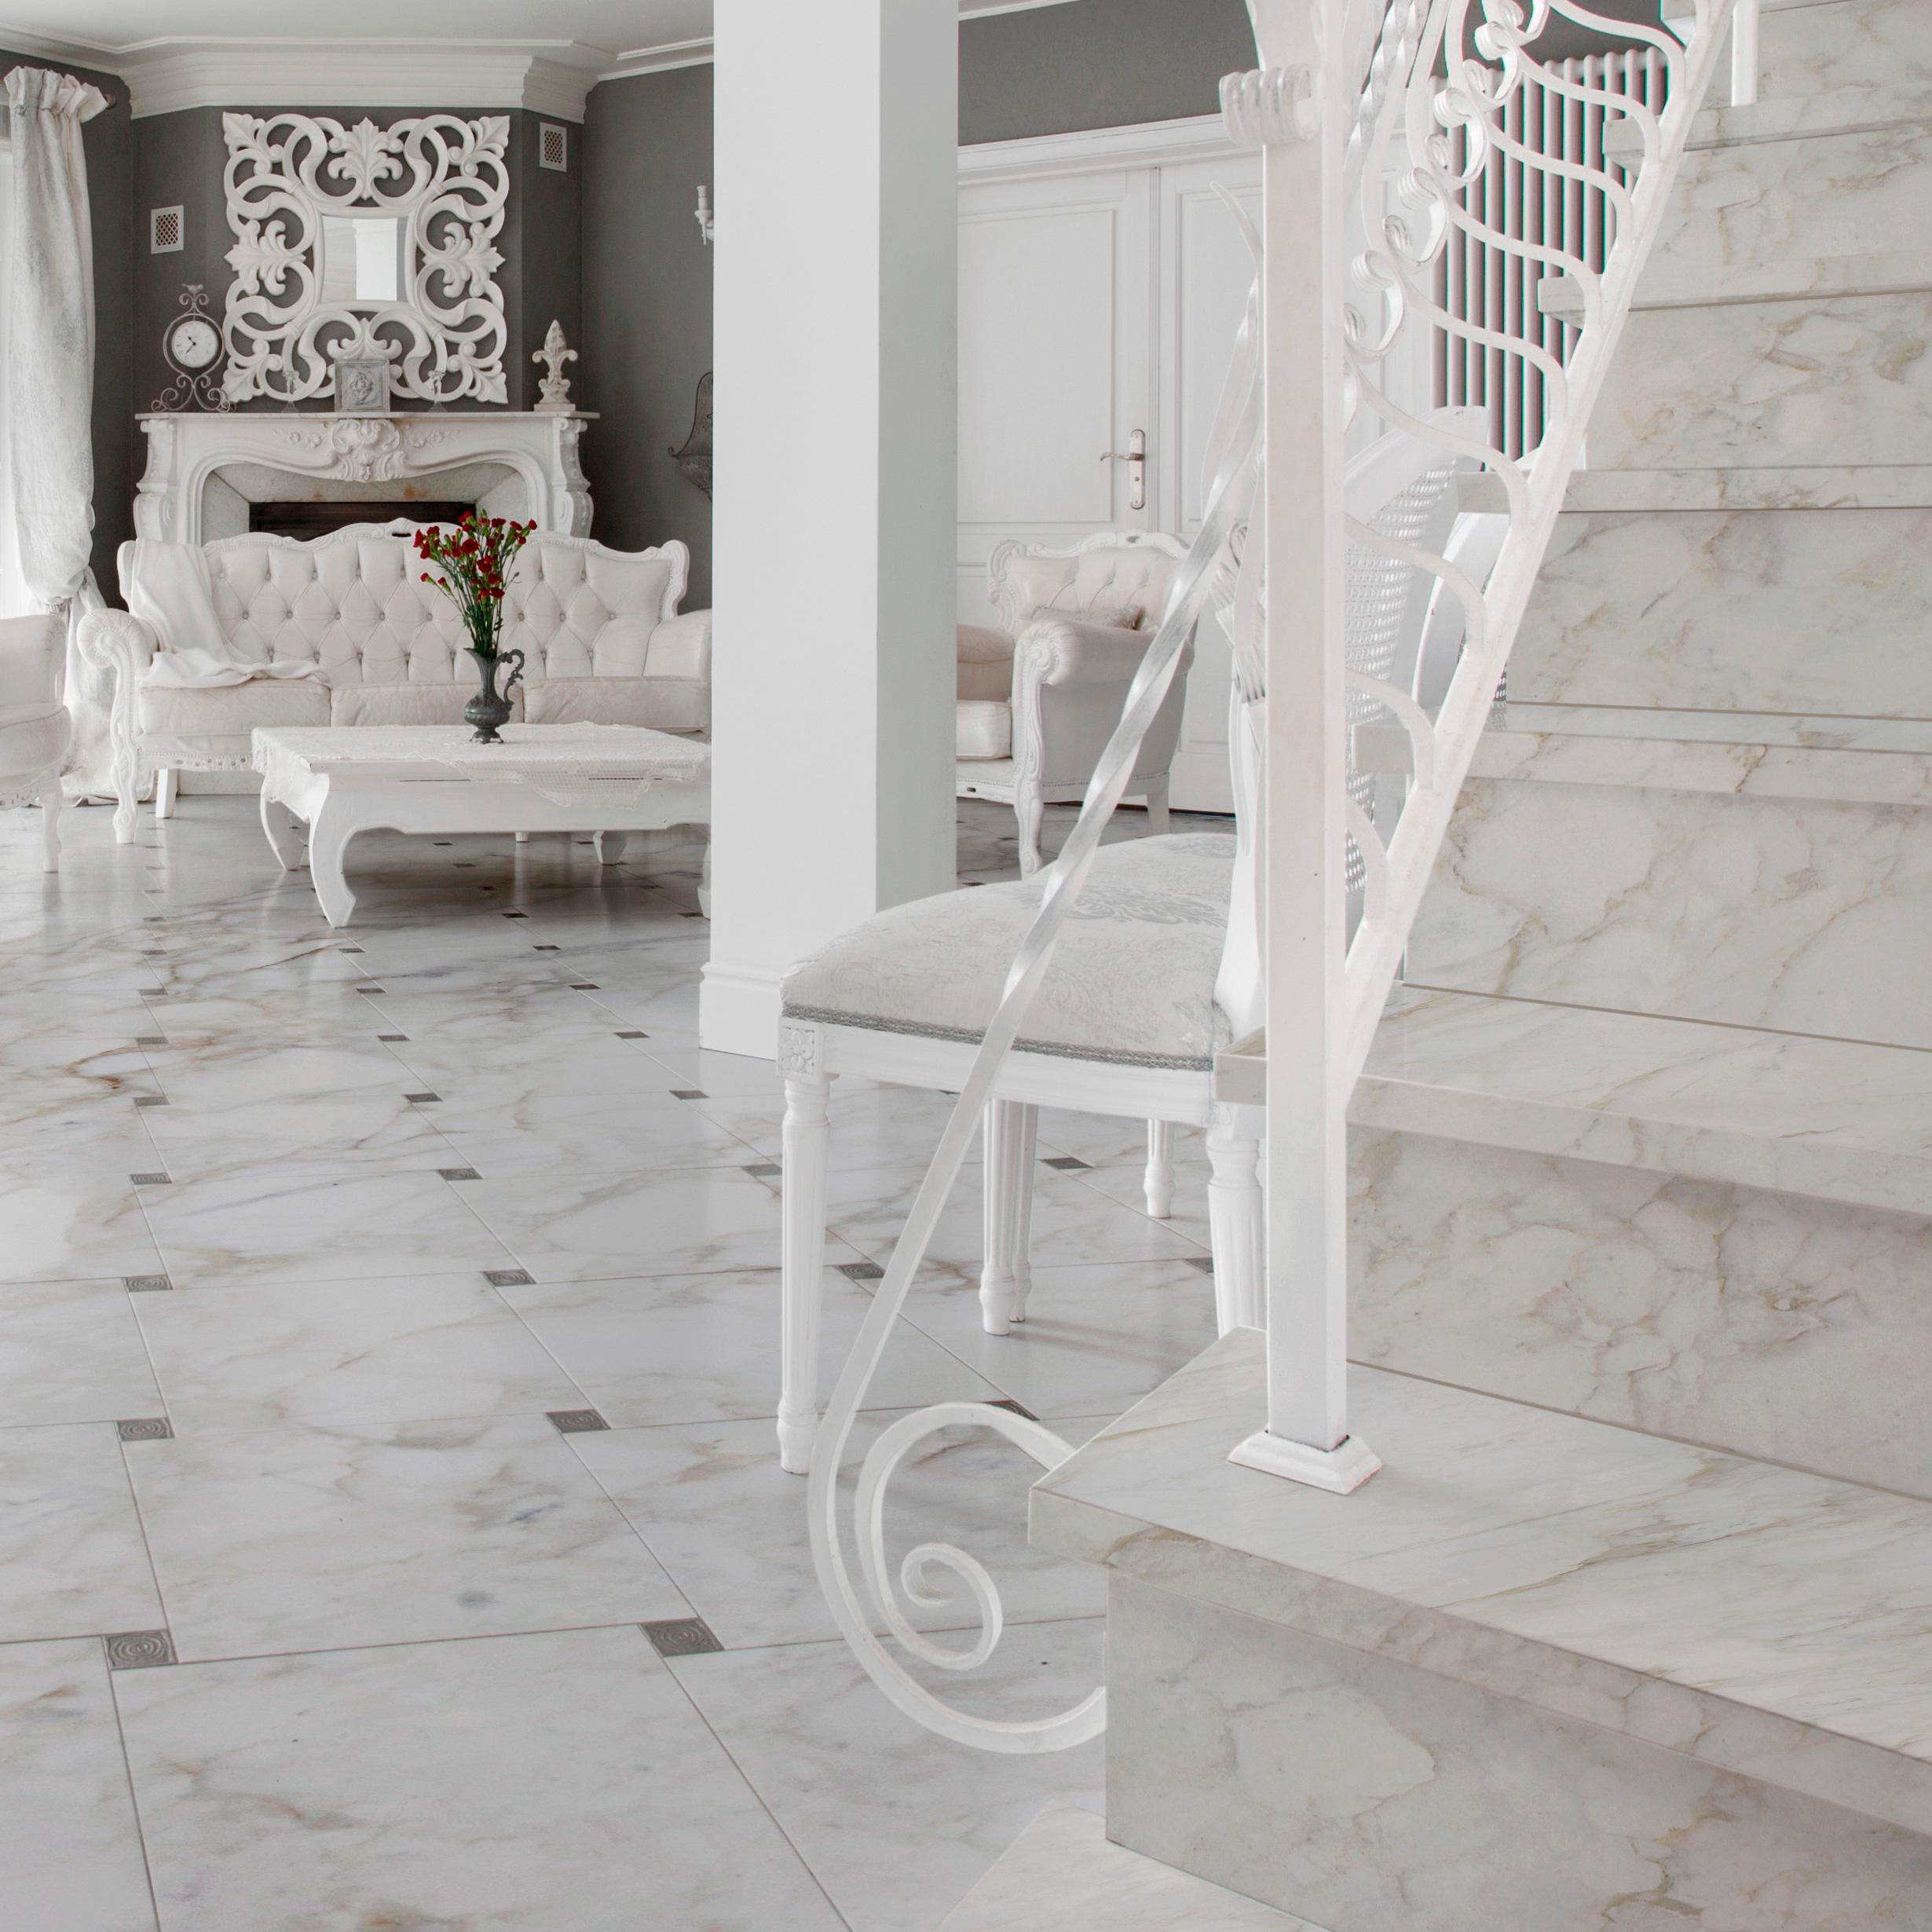 Pavimento e scala in marmo